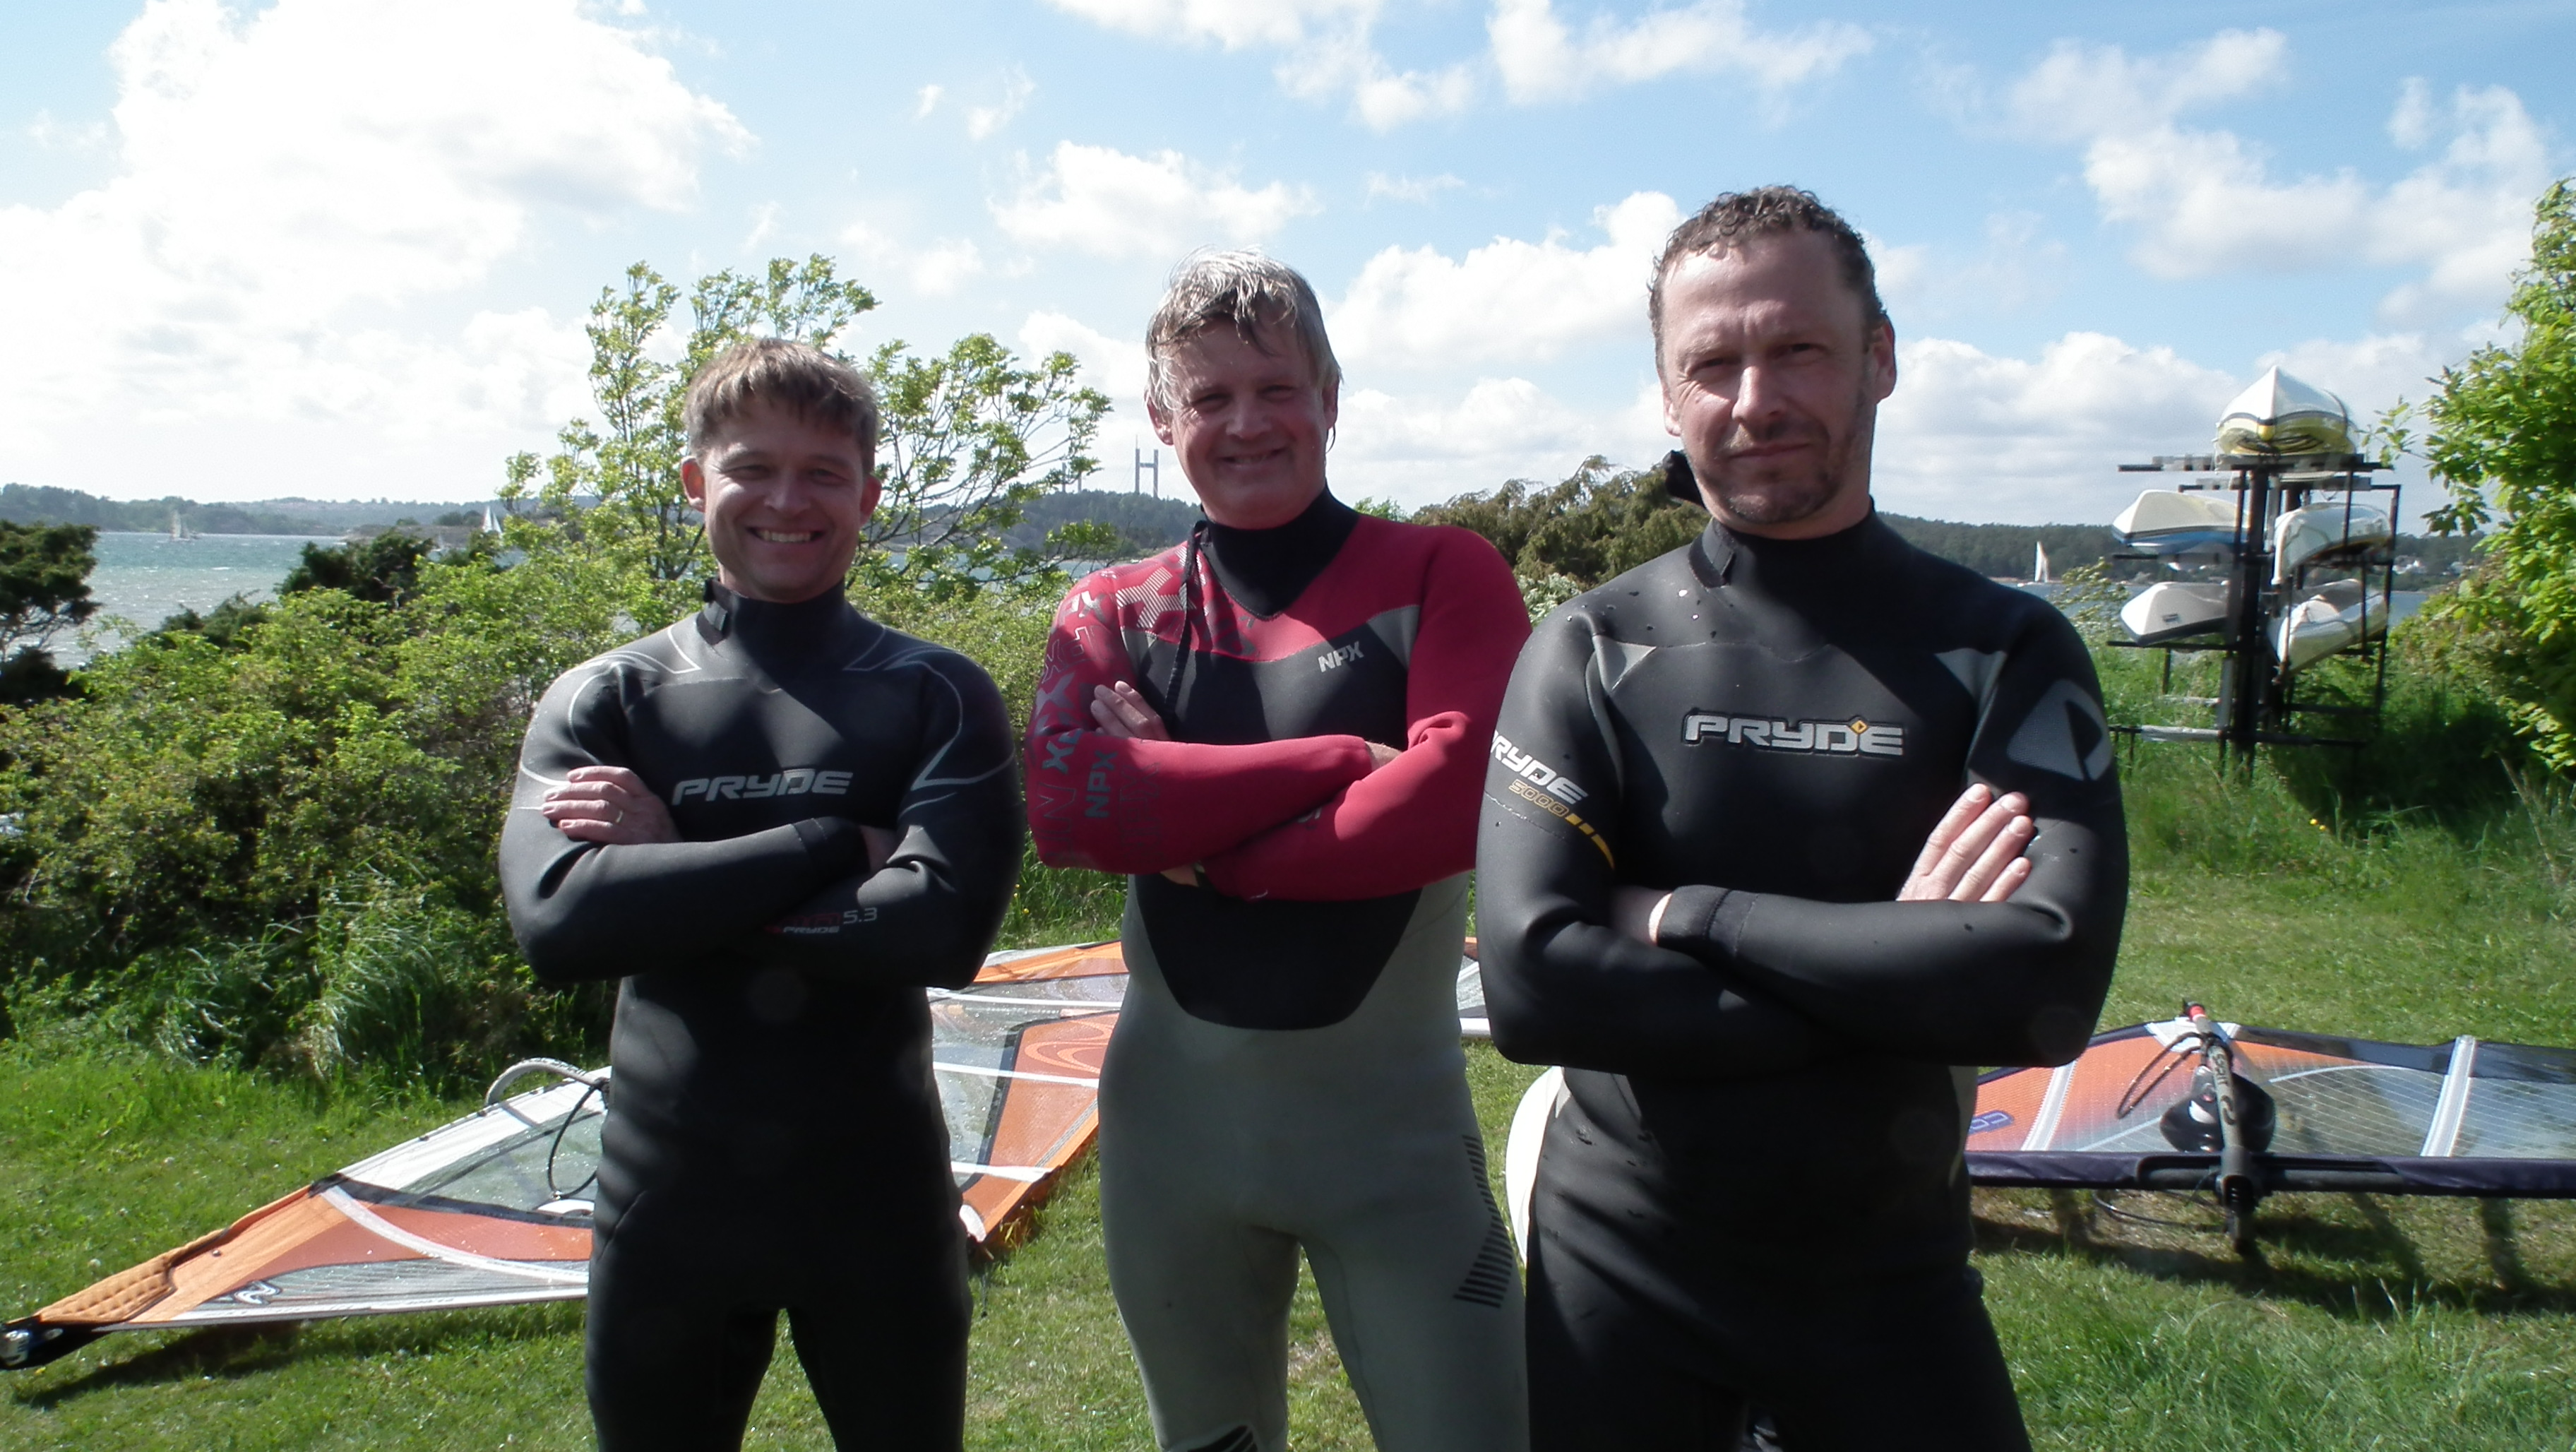 044. 50 taggarna från Wave action. efter en skön session vid Tollenäs